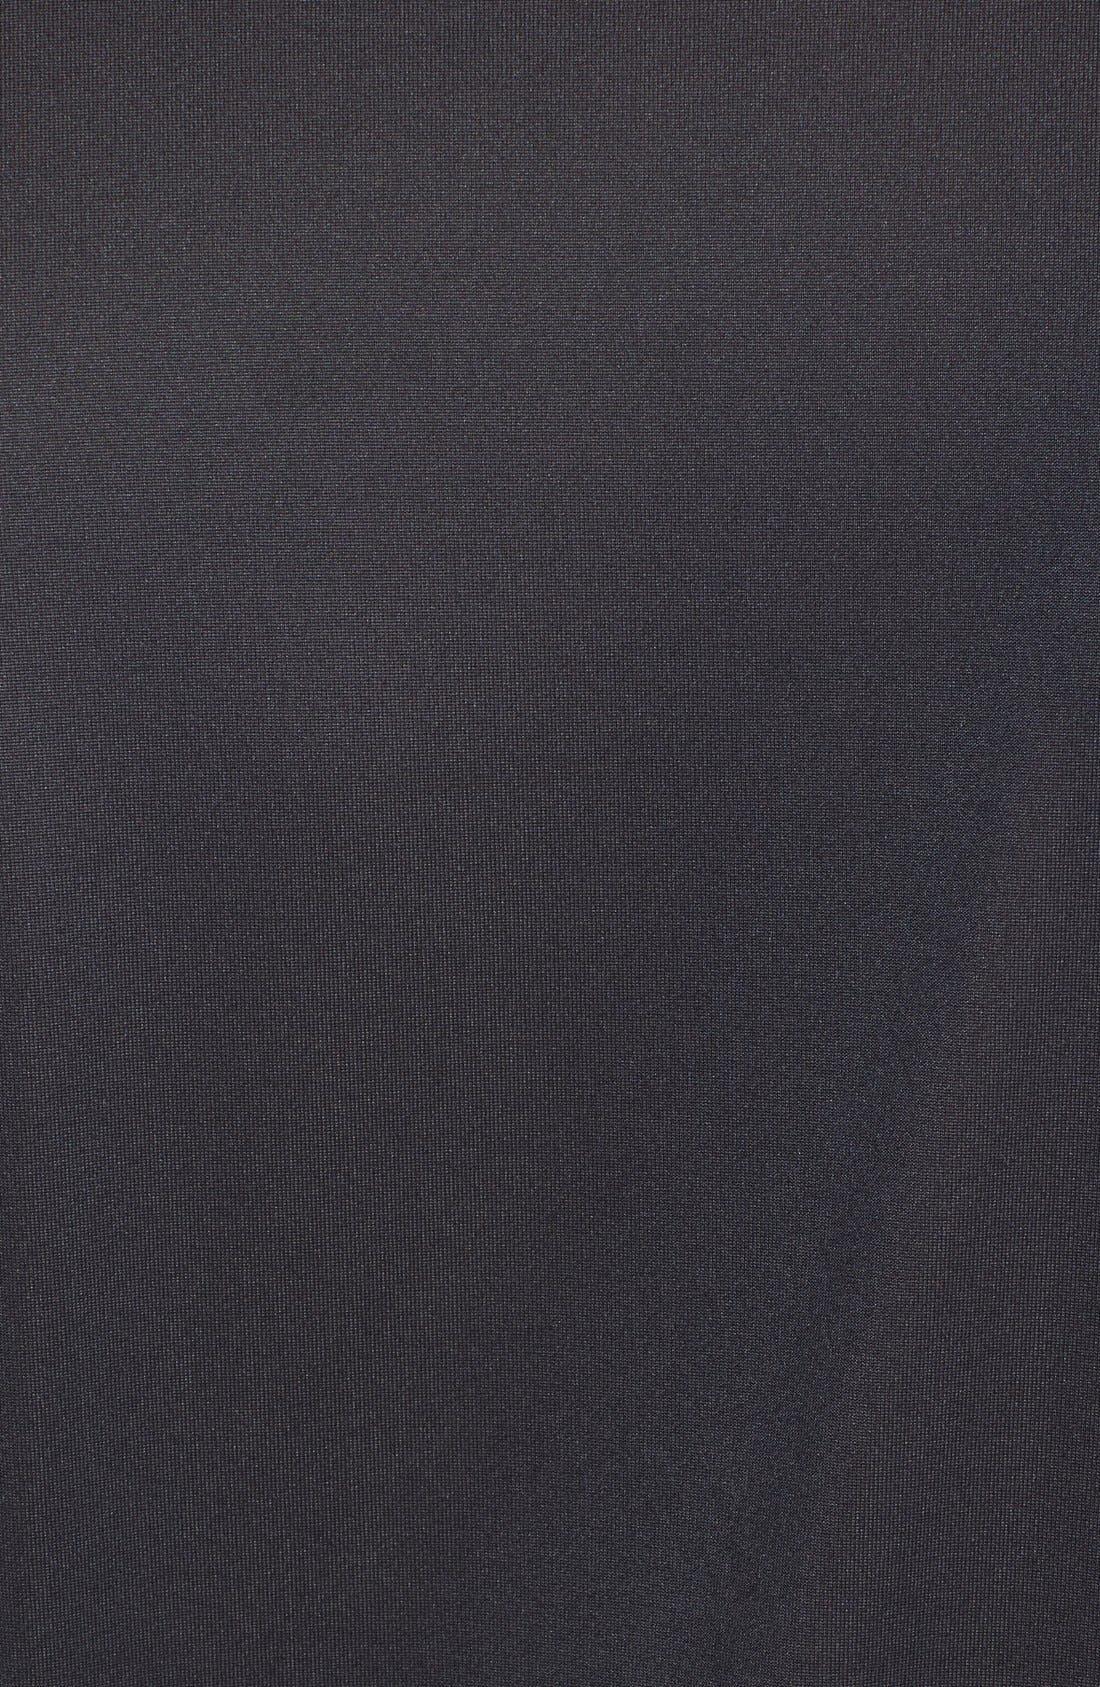 HELLY HANSEN,                             'VTR' Quick Dry T-Shirt,                             Alternate thumbnail 2, color,                             001